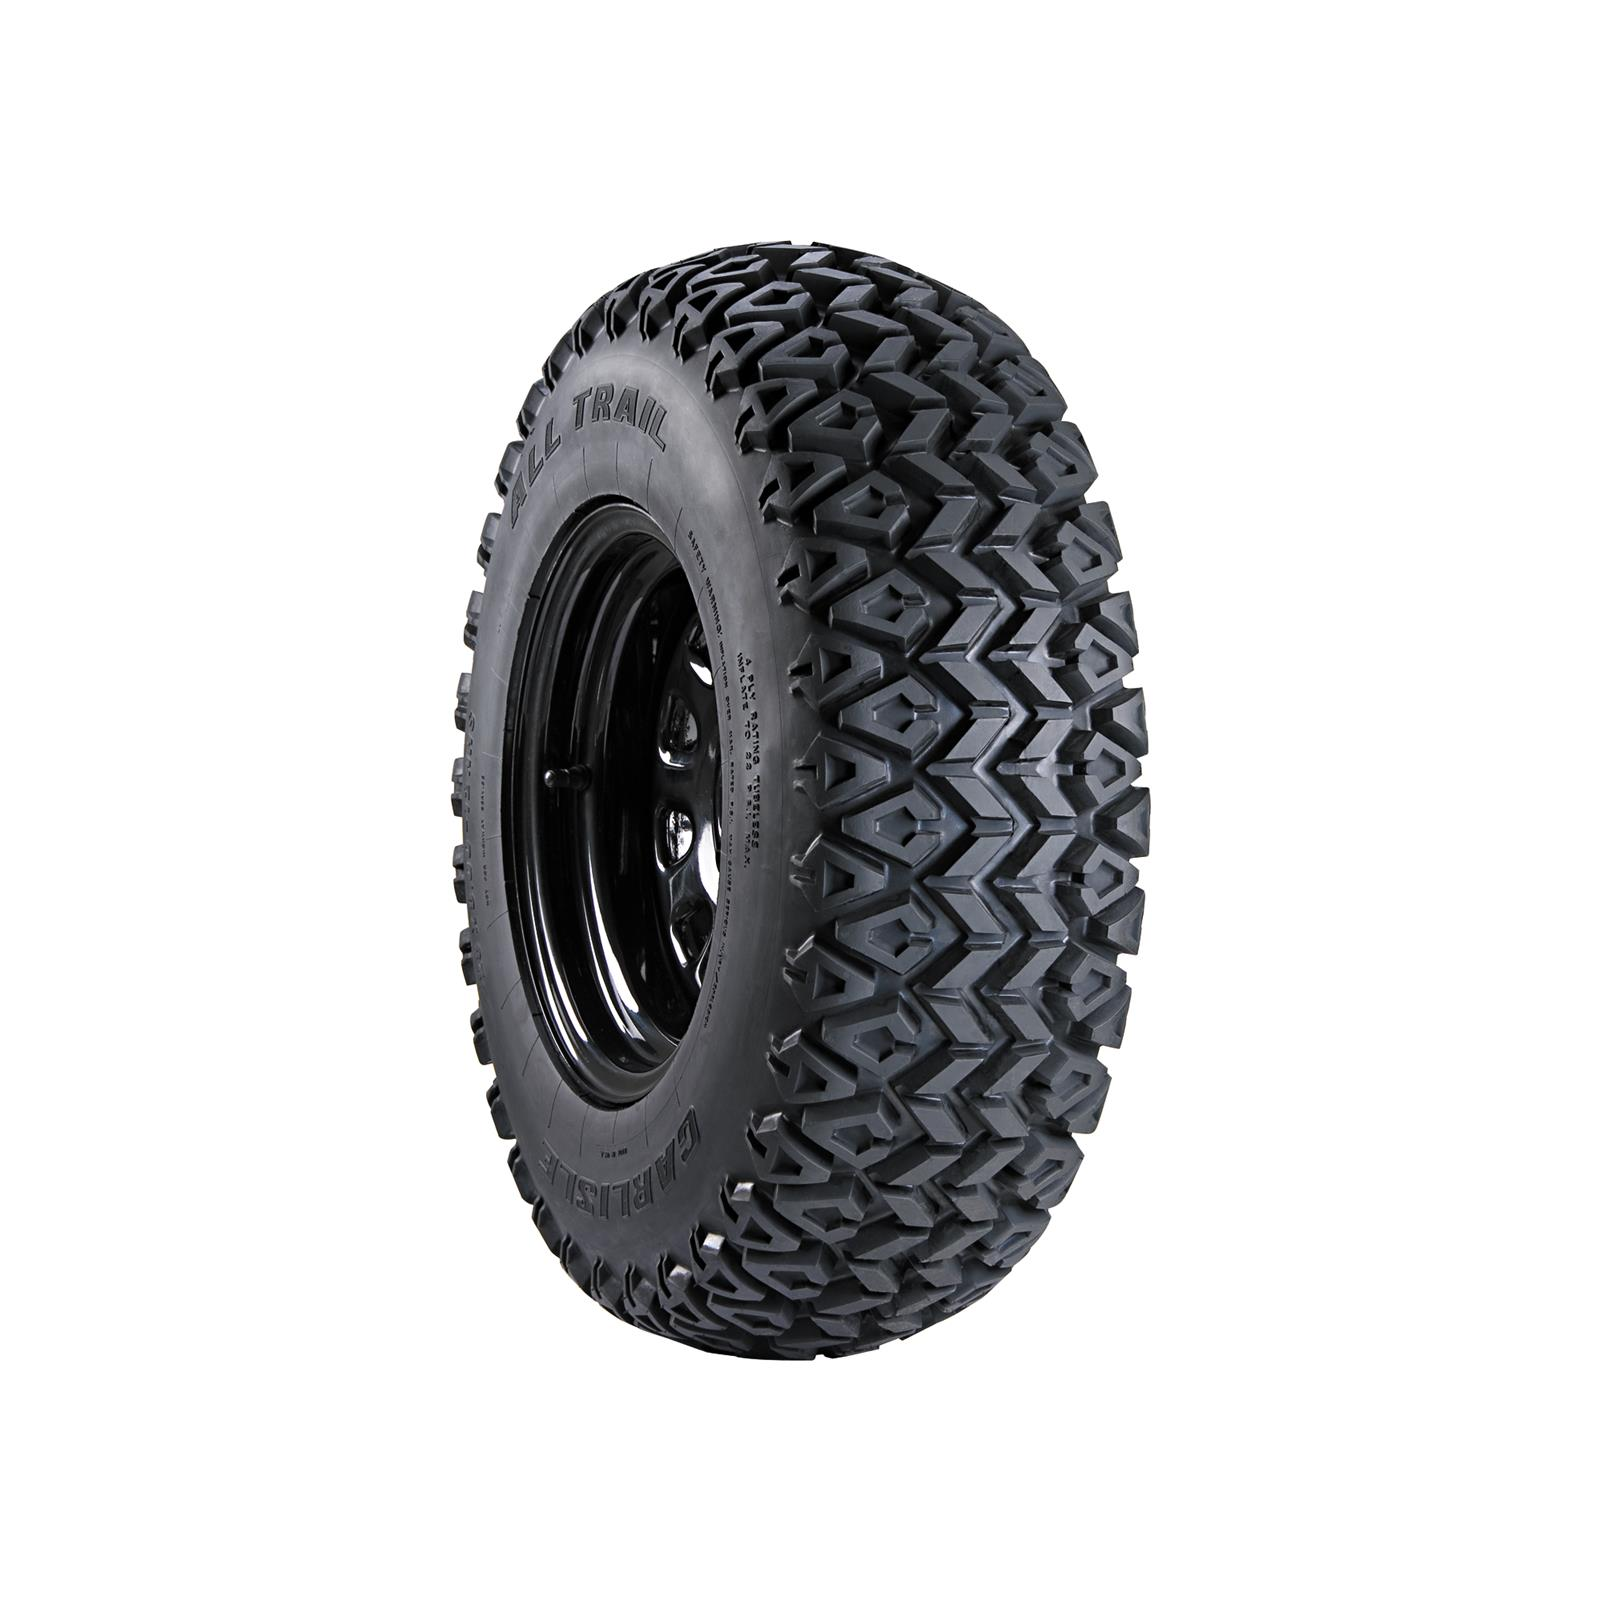 Carlisle All Trail ATV Tire 25X8-12